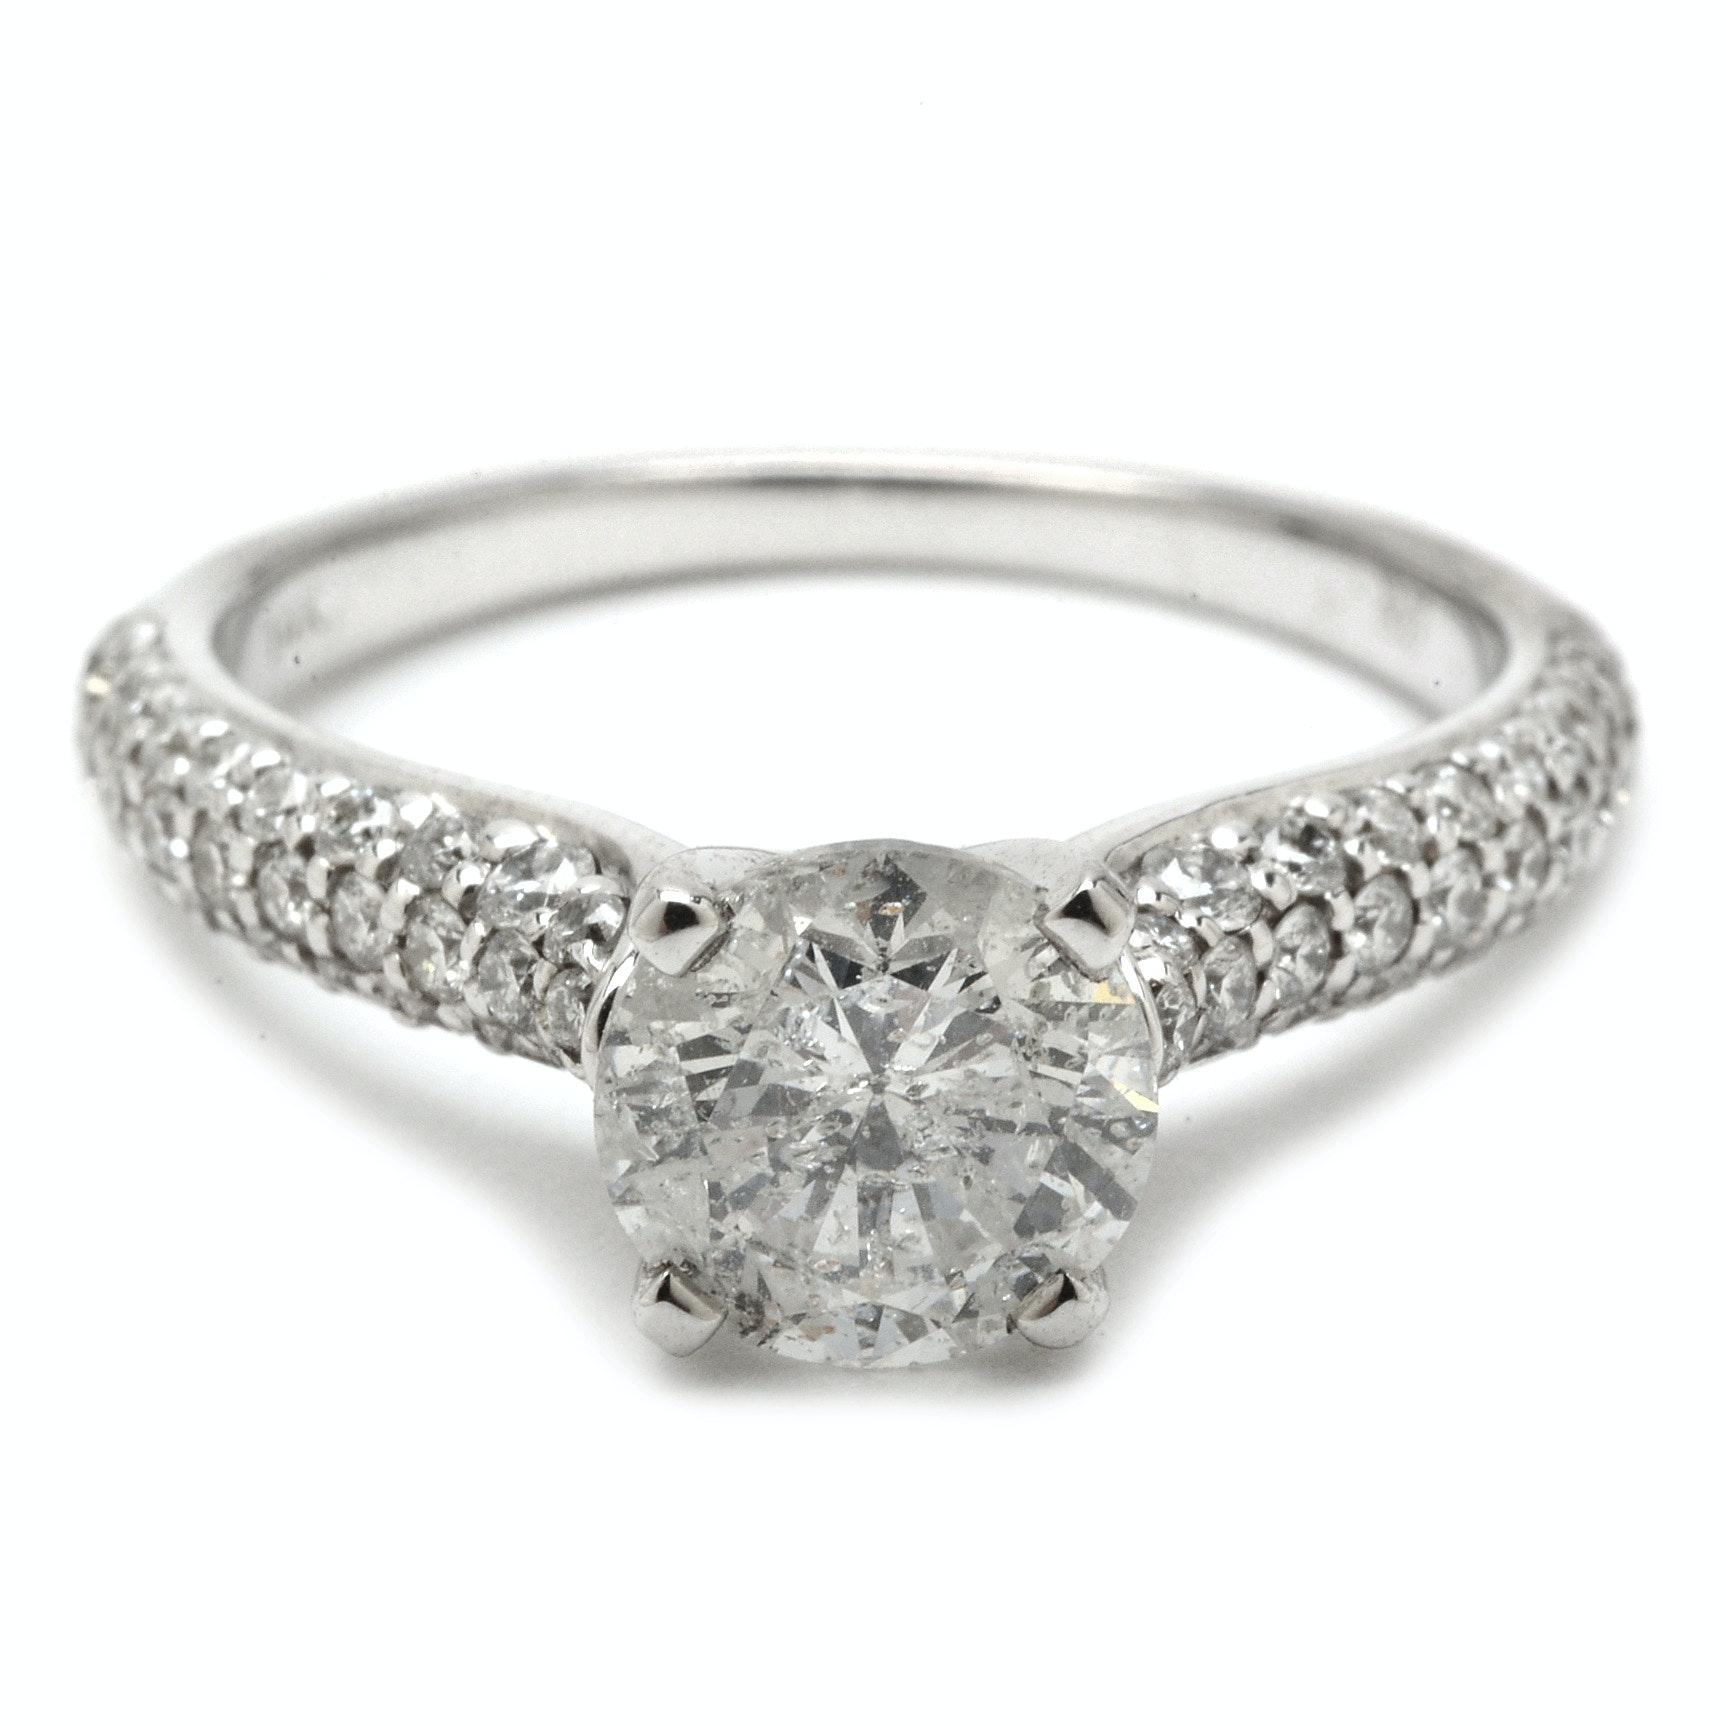 14K White Gold 1.58 CTW Diamond Engagement Ring